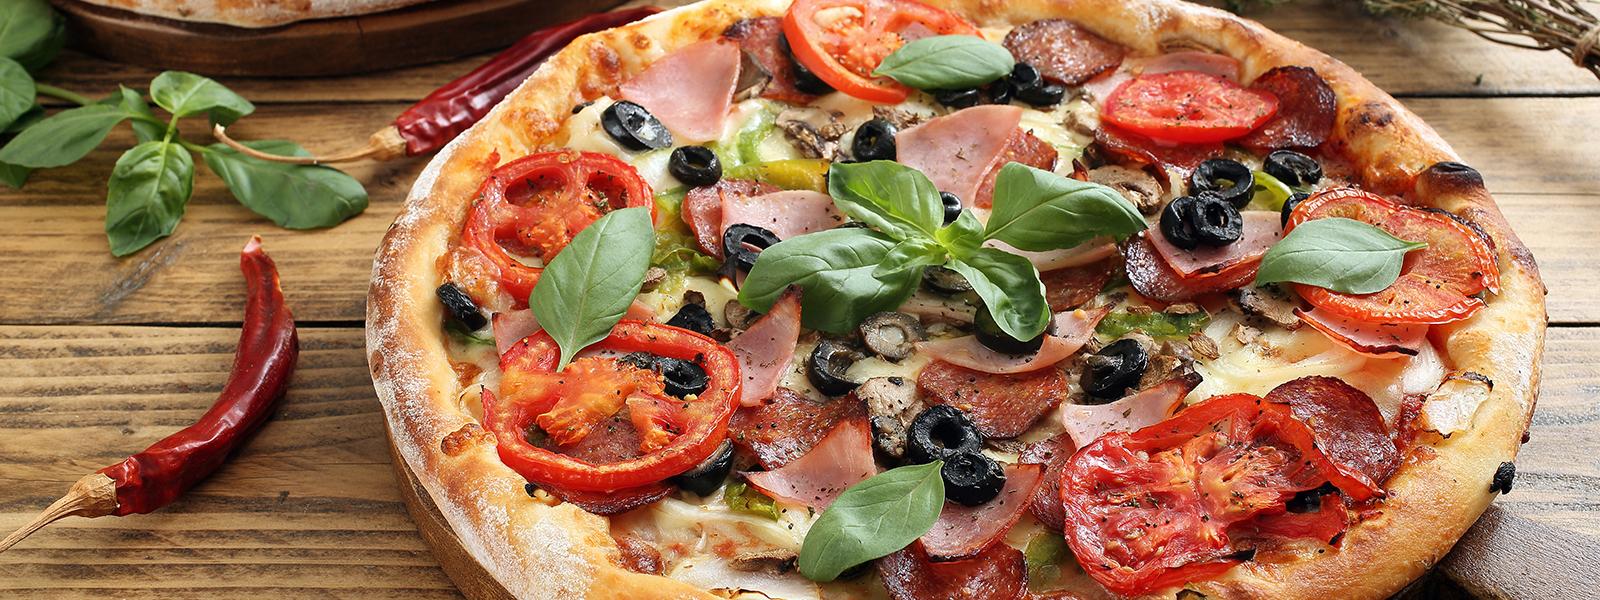 Pizza 369 Pizza 369 Birmingham Takeaway Order Online